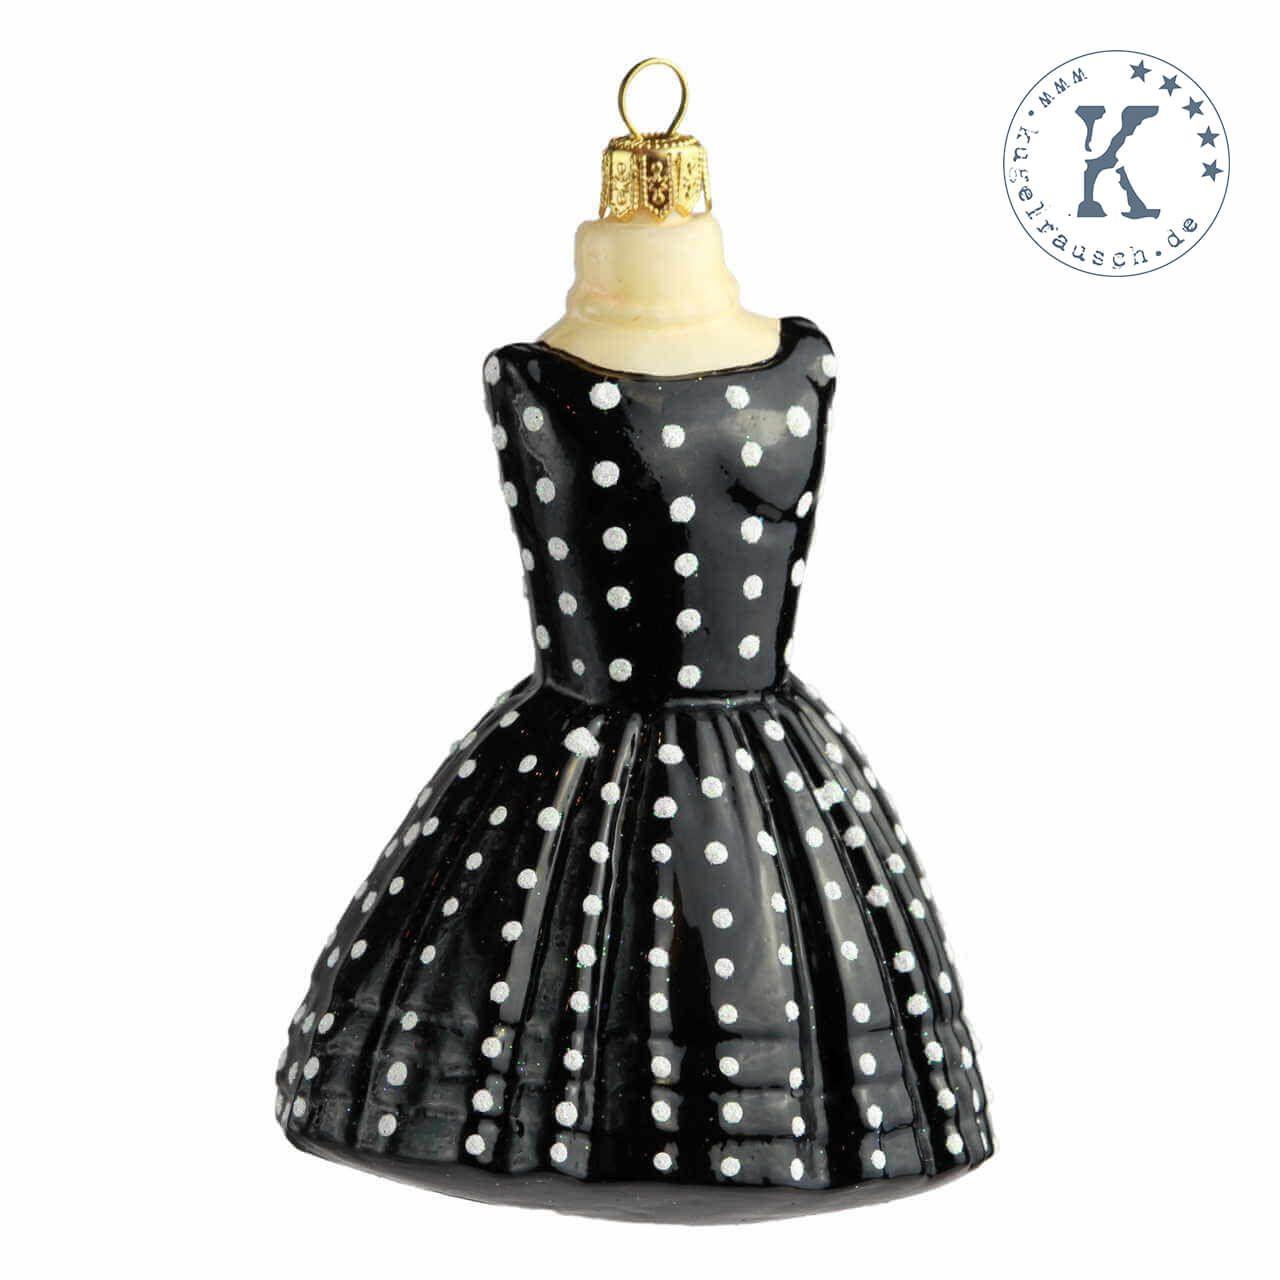 Christbaumkugel: Kleid | Kleider, Elegantes cocktailkleid ...